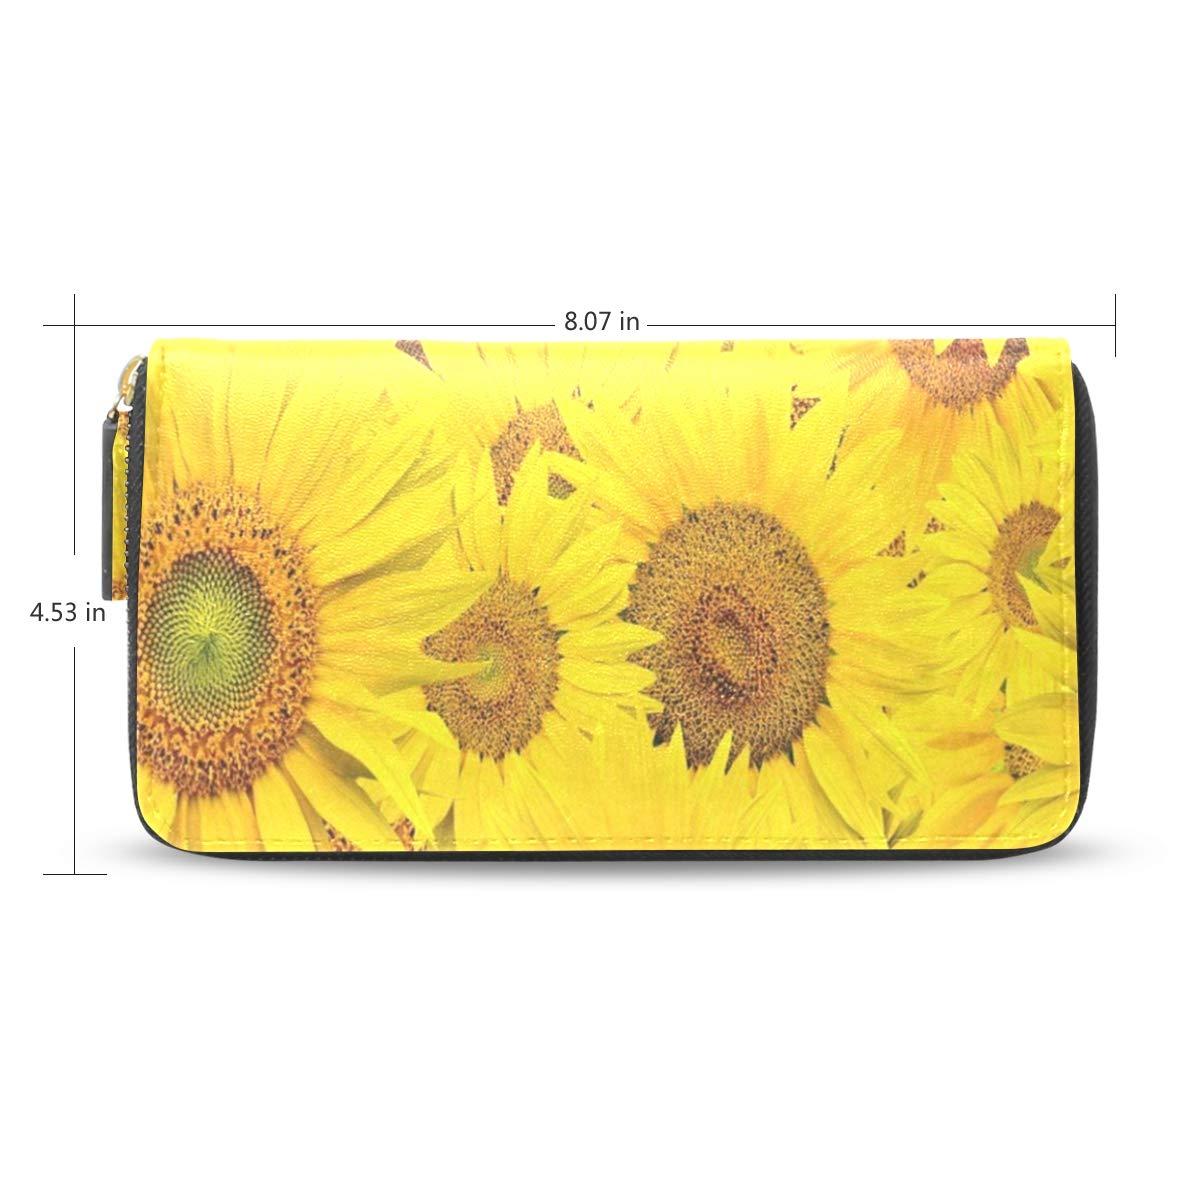 Womens Wallets Sunflower Yellow Leather Passport Wallet Change Coin Purse Girls Handbags